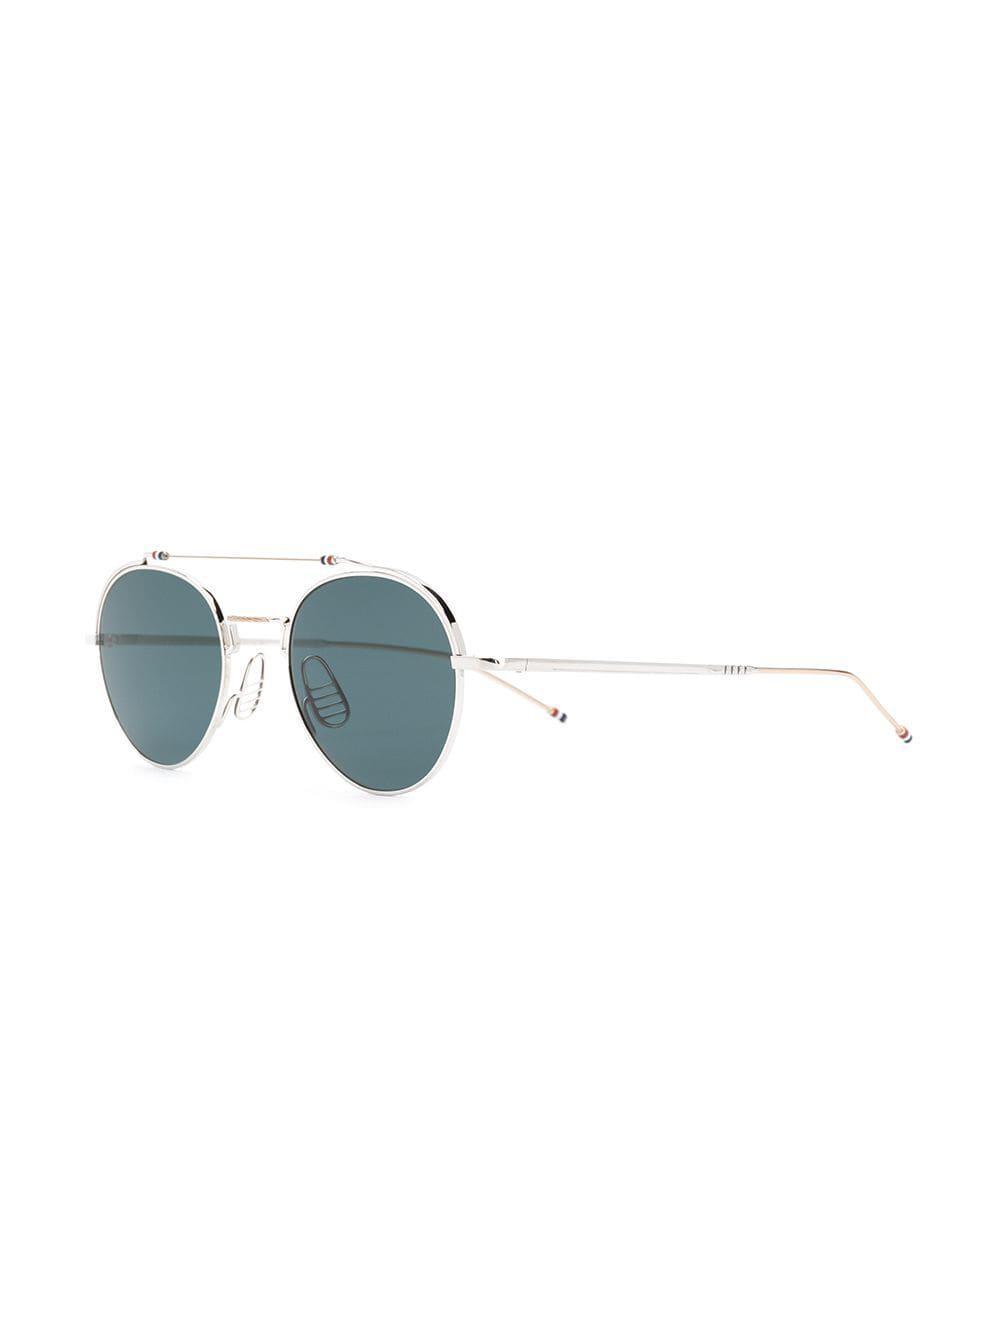 ab16e10b2c2 Lyst - Thom Browne Aviator Sunglasses in Metallic for Men